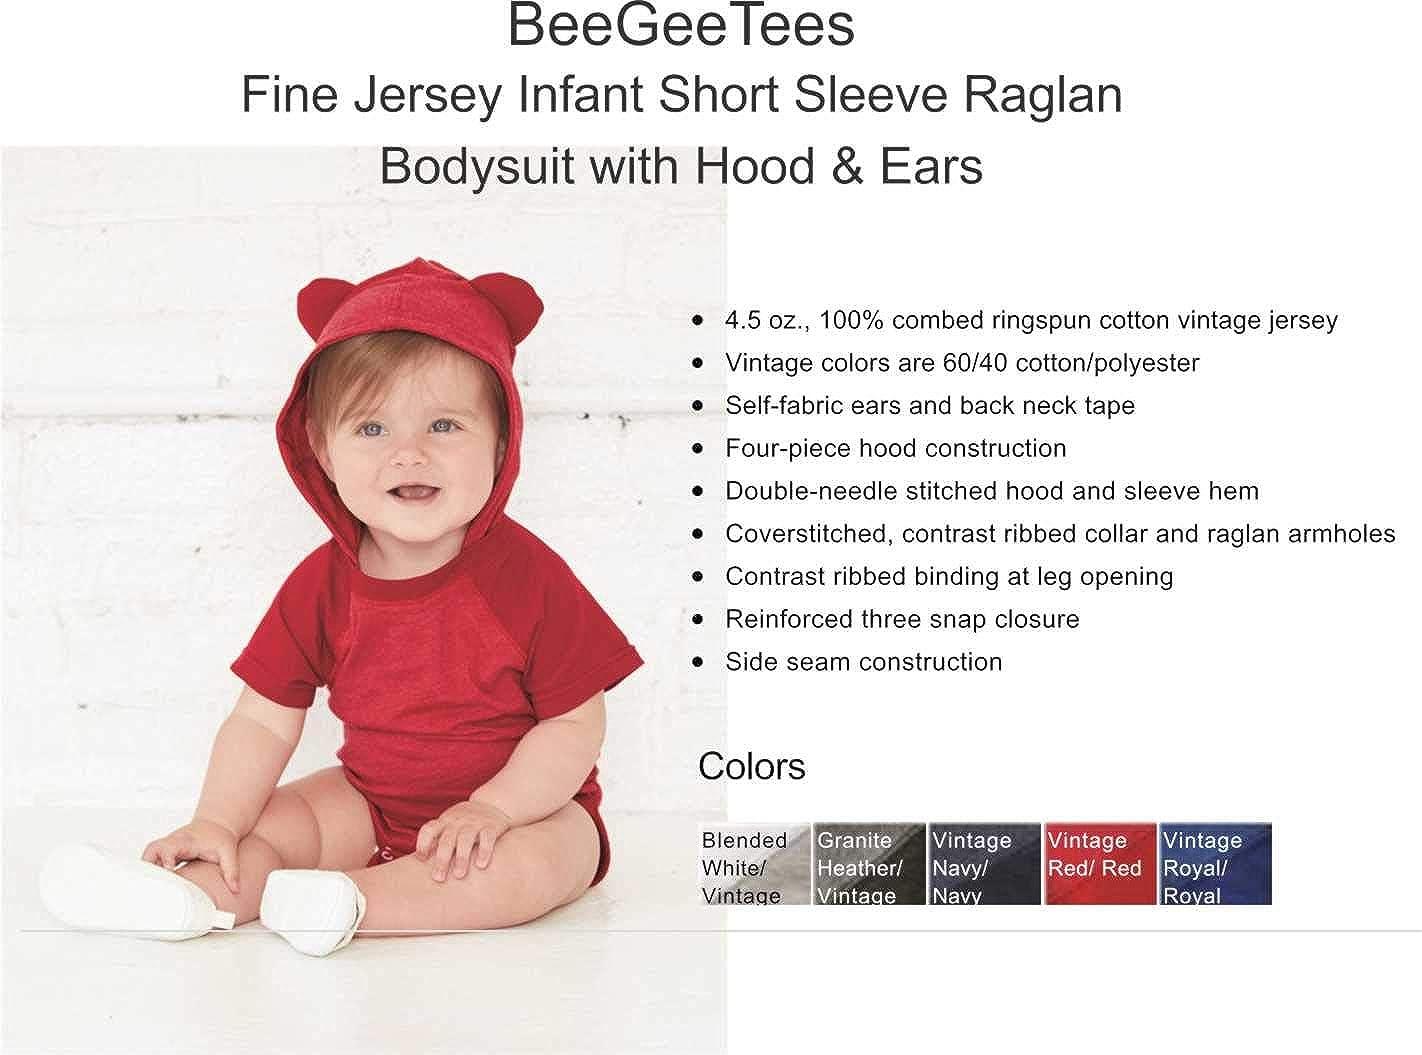 BeeGeeTees Accio Spoon Funny Baby Romper Infant Wizard Bodysuit